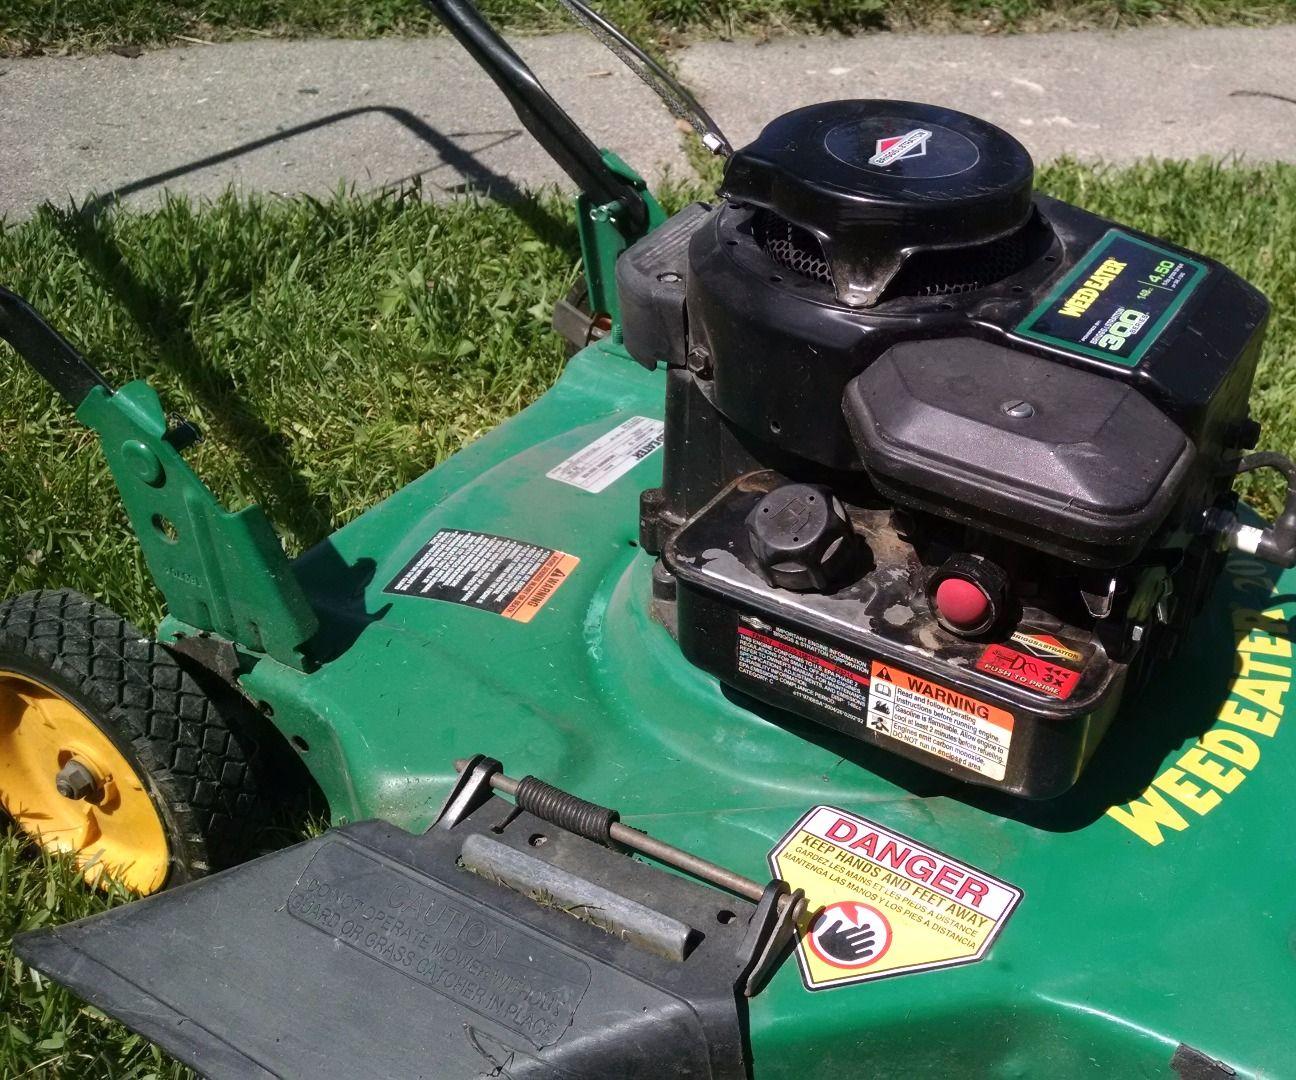 Stupendous Fixing A Briggs Stratton Surging Lawnmower Bolens Push Mower Oil Drain Plug Bolens Push Mower Oil houzz-03 Bolens Push Mower